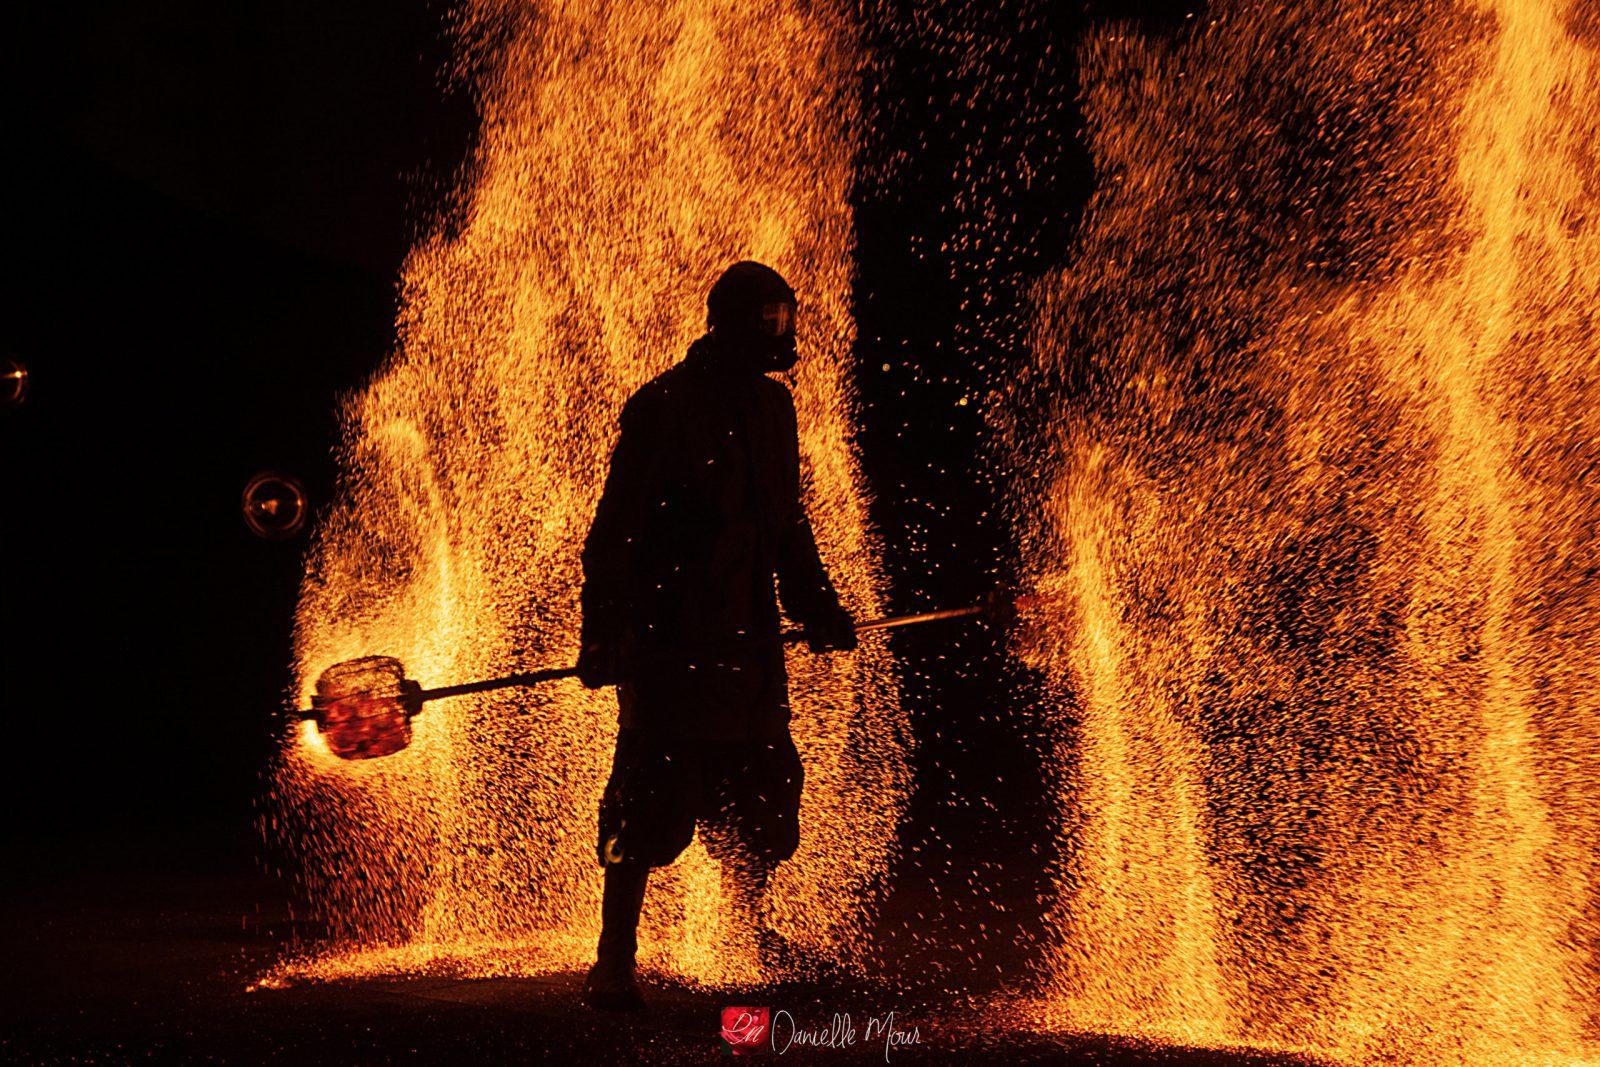 spectacle de feu,jongleurs de feu, compagnie belizama, cracheurs de feu, spectacle de rue, spectacle de feu bretagne, spectacle pyrotechnique, belizama, bretagne,spectacle de feu normandie,Aunay sur Odon